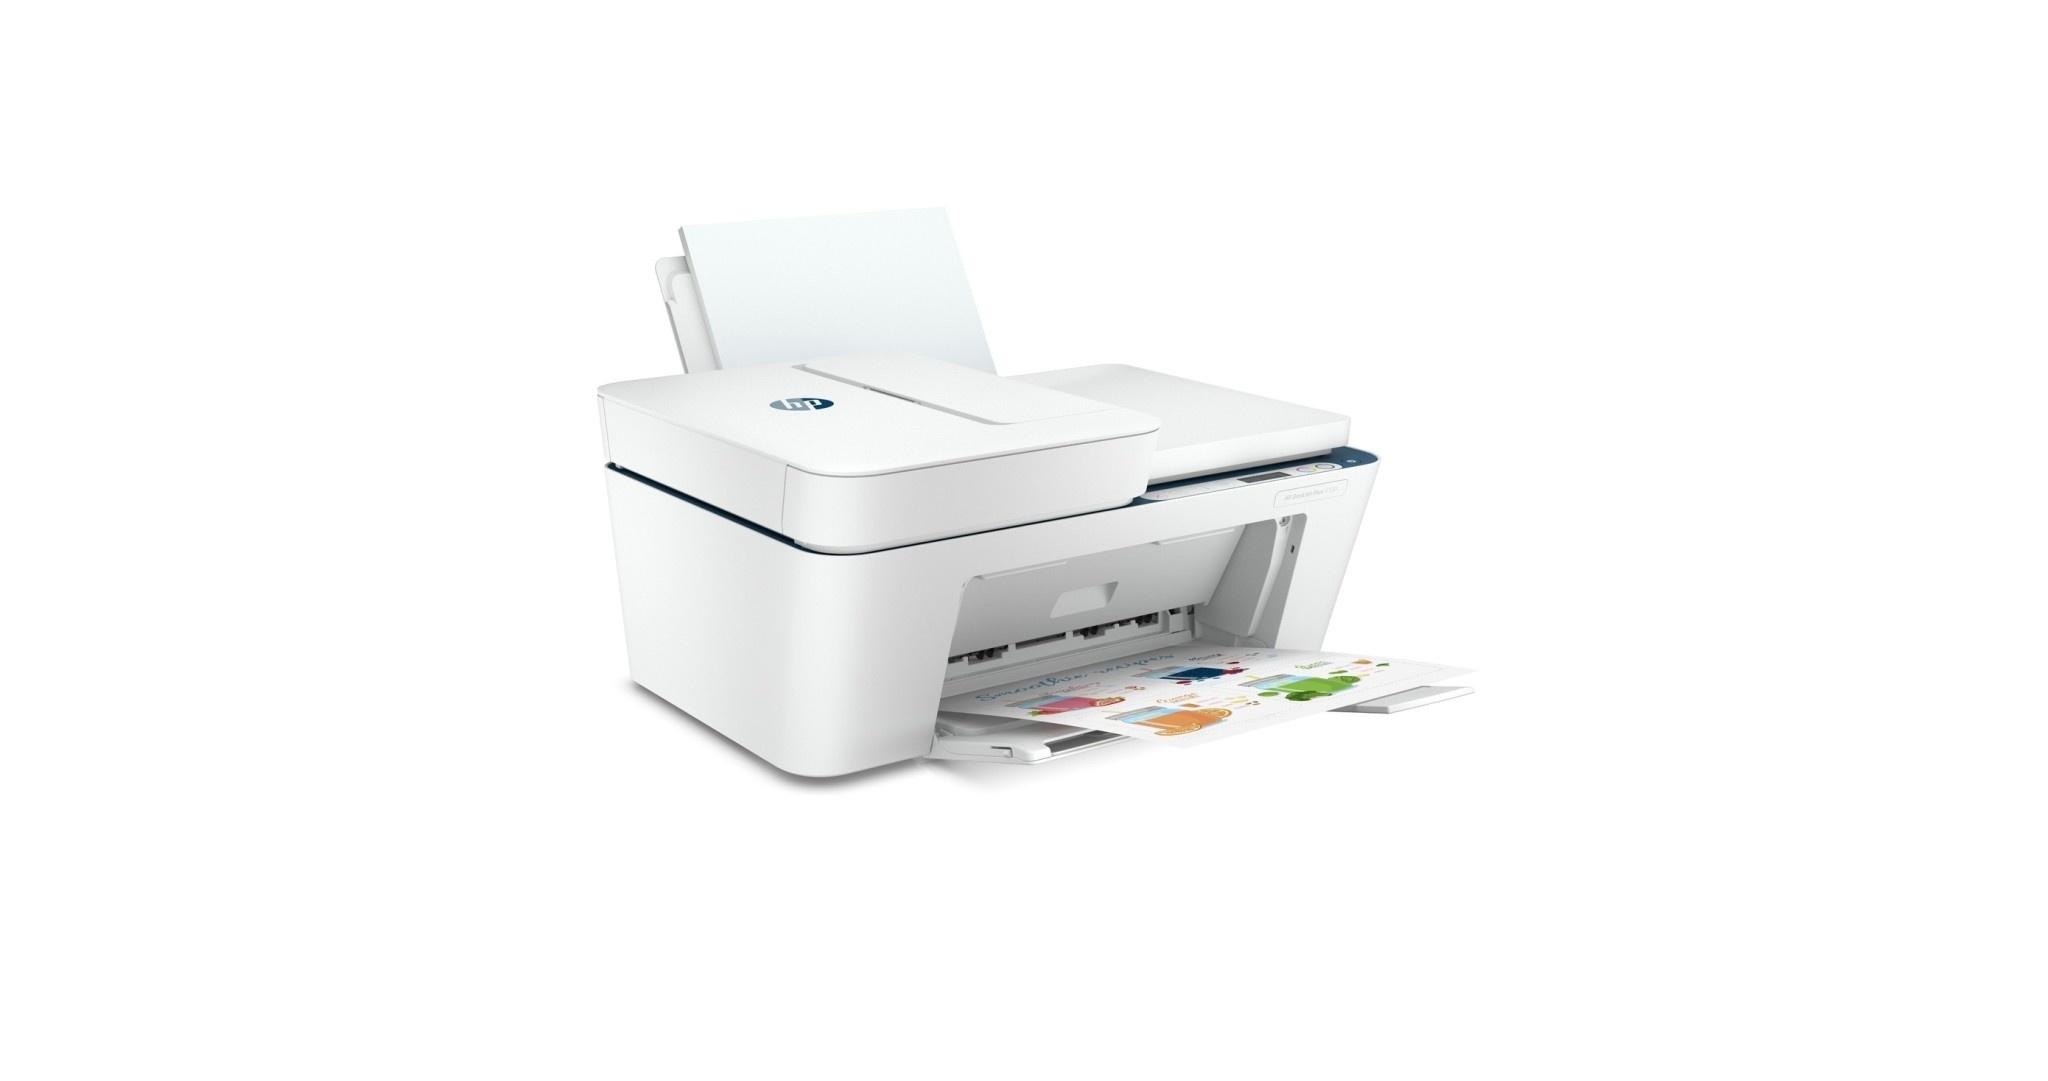 HP Deskjet Plus 4130 A4 All in One Printer met WiFi